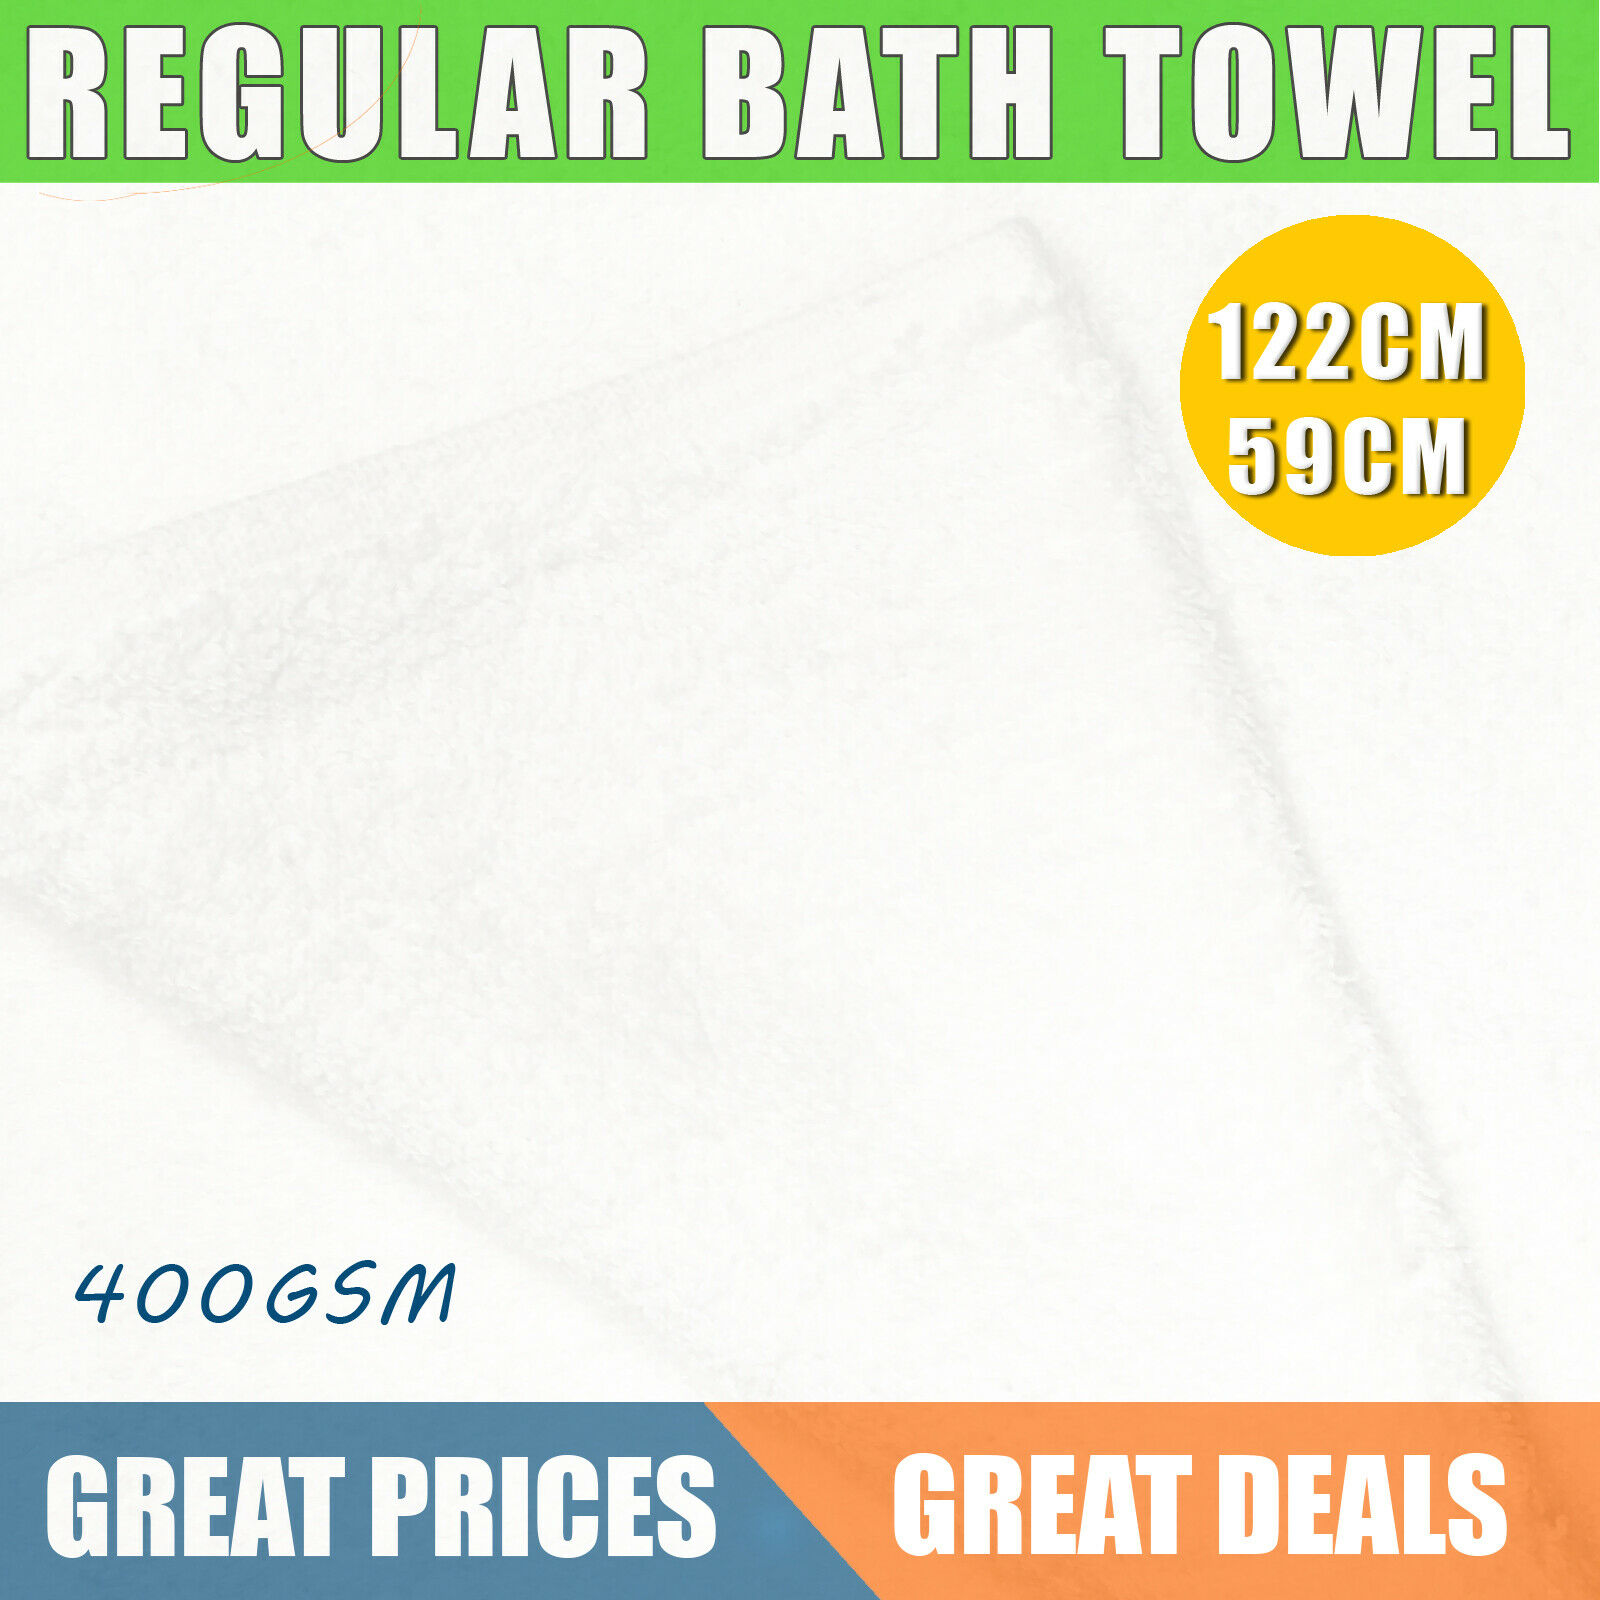 X3 Regular Bath Towel 122cm x 59cm quick dry, Long Enough To Wrap Around